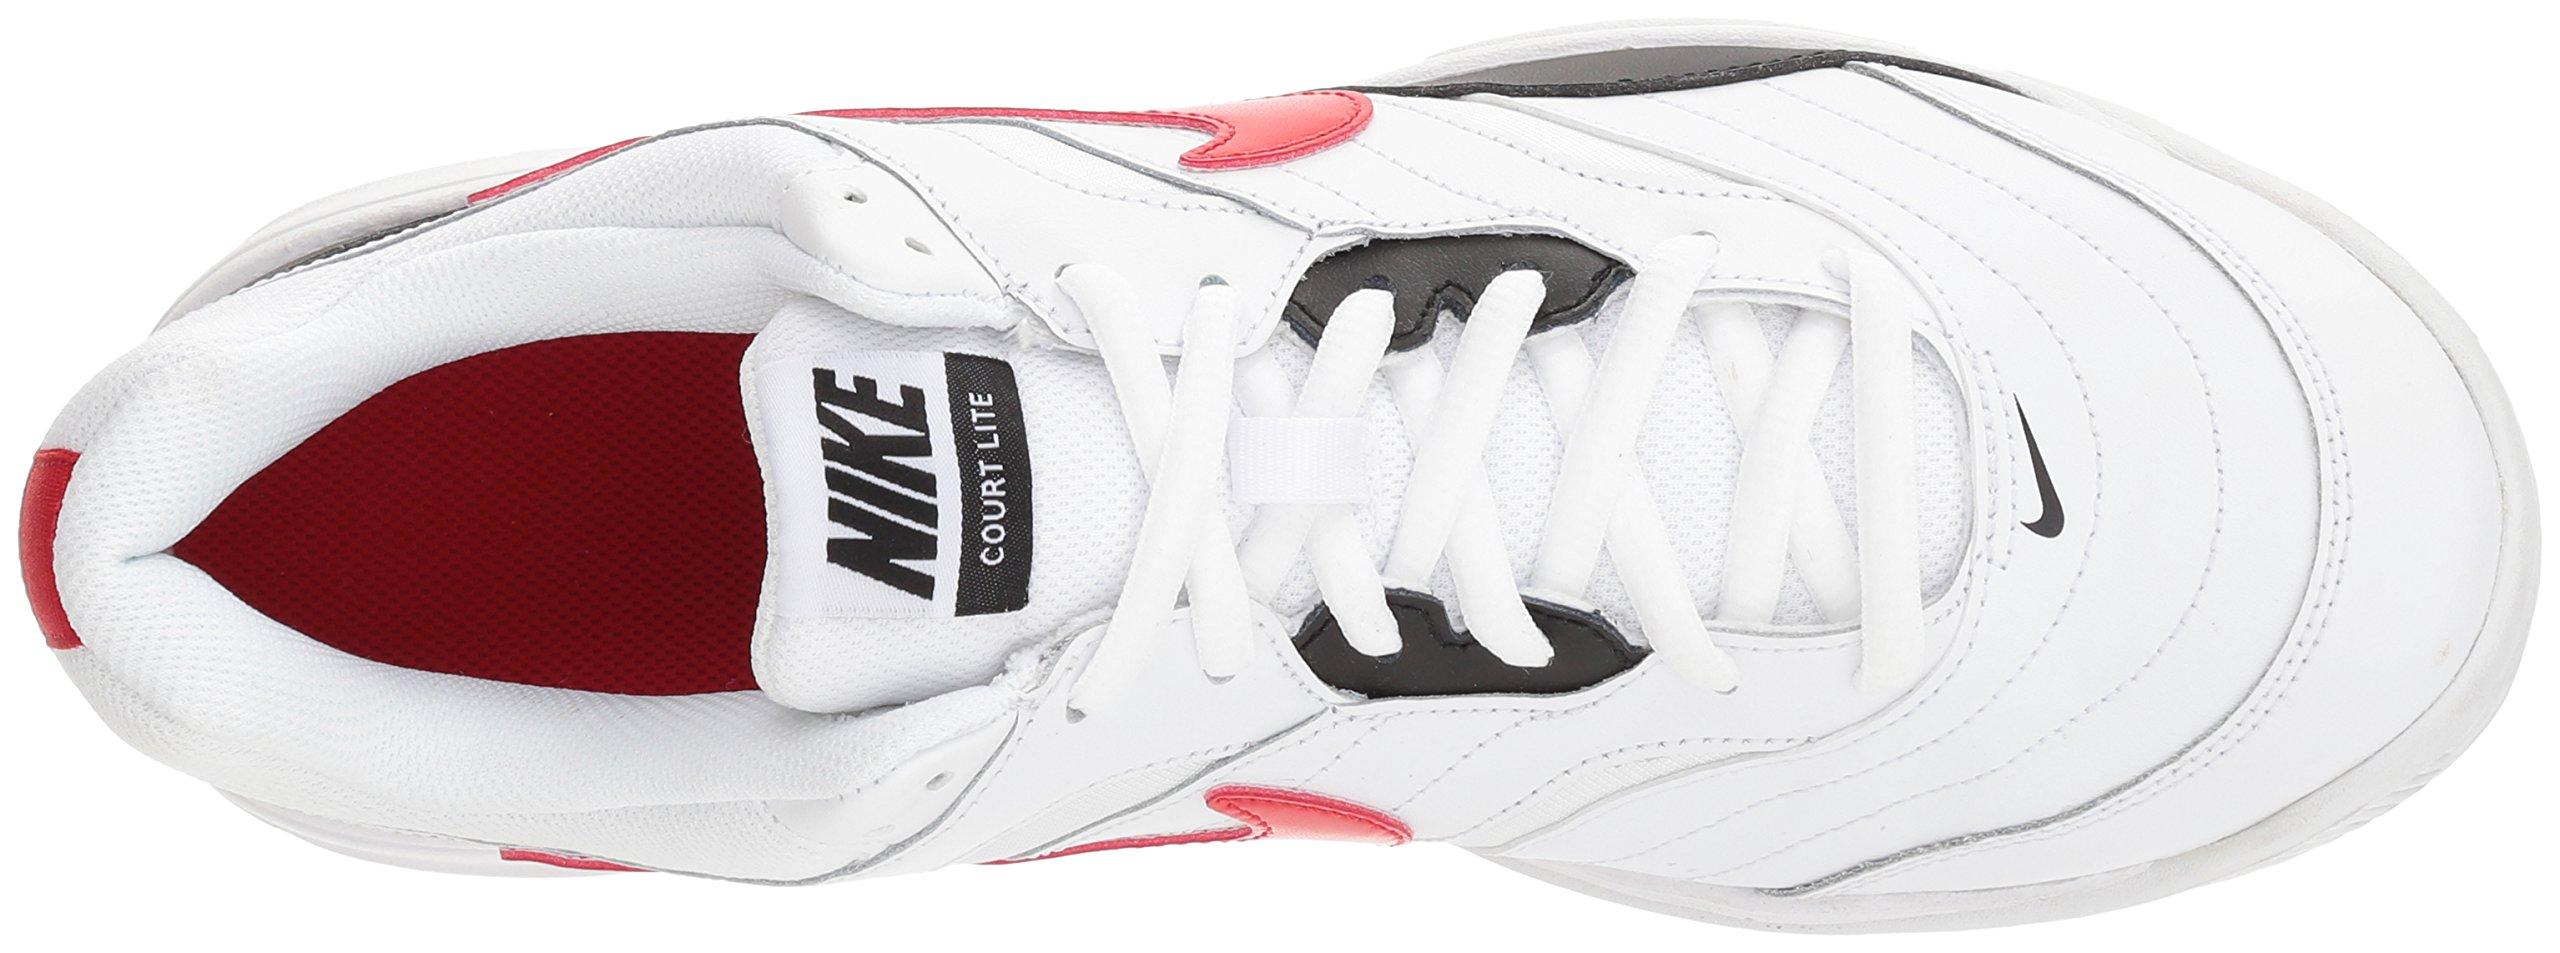 Nike Men's Court Lite Tennis Shoe, White/University red/Black, 7.5 D US by Nike (Image #8)